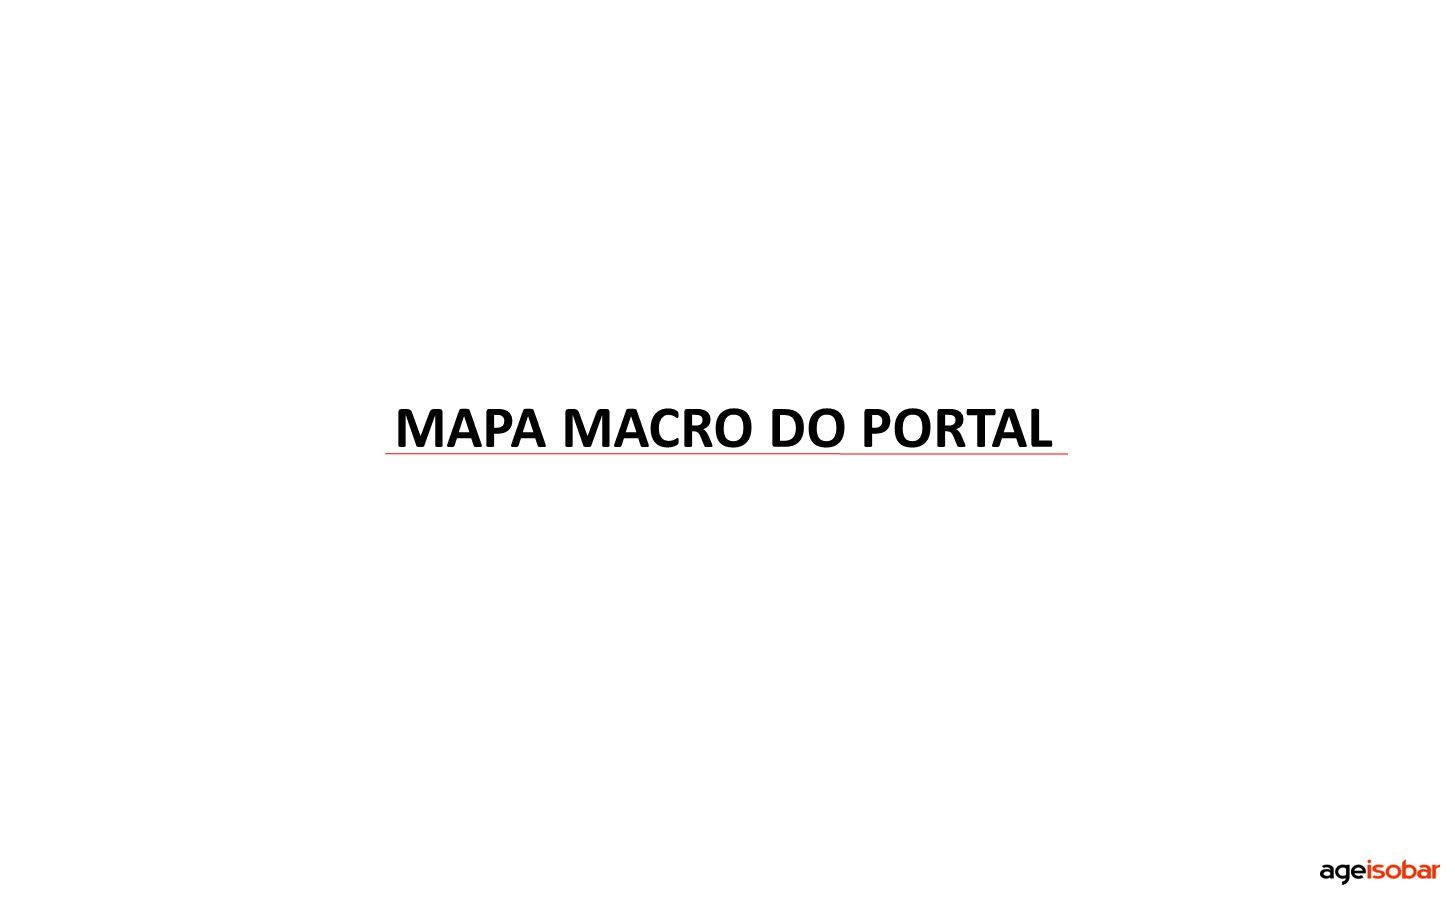 MAPA MACRO DO PORTAL